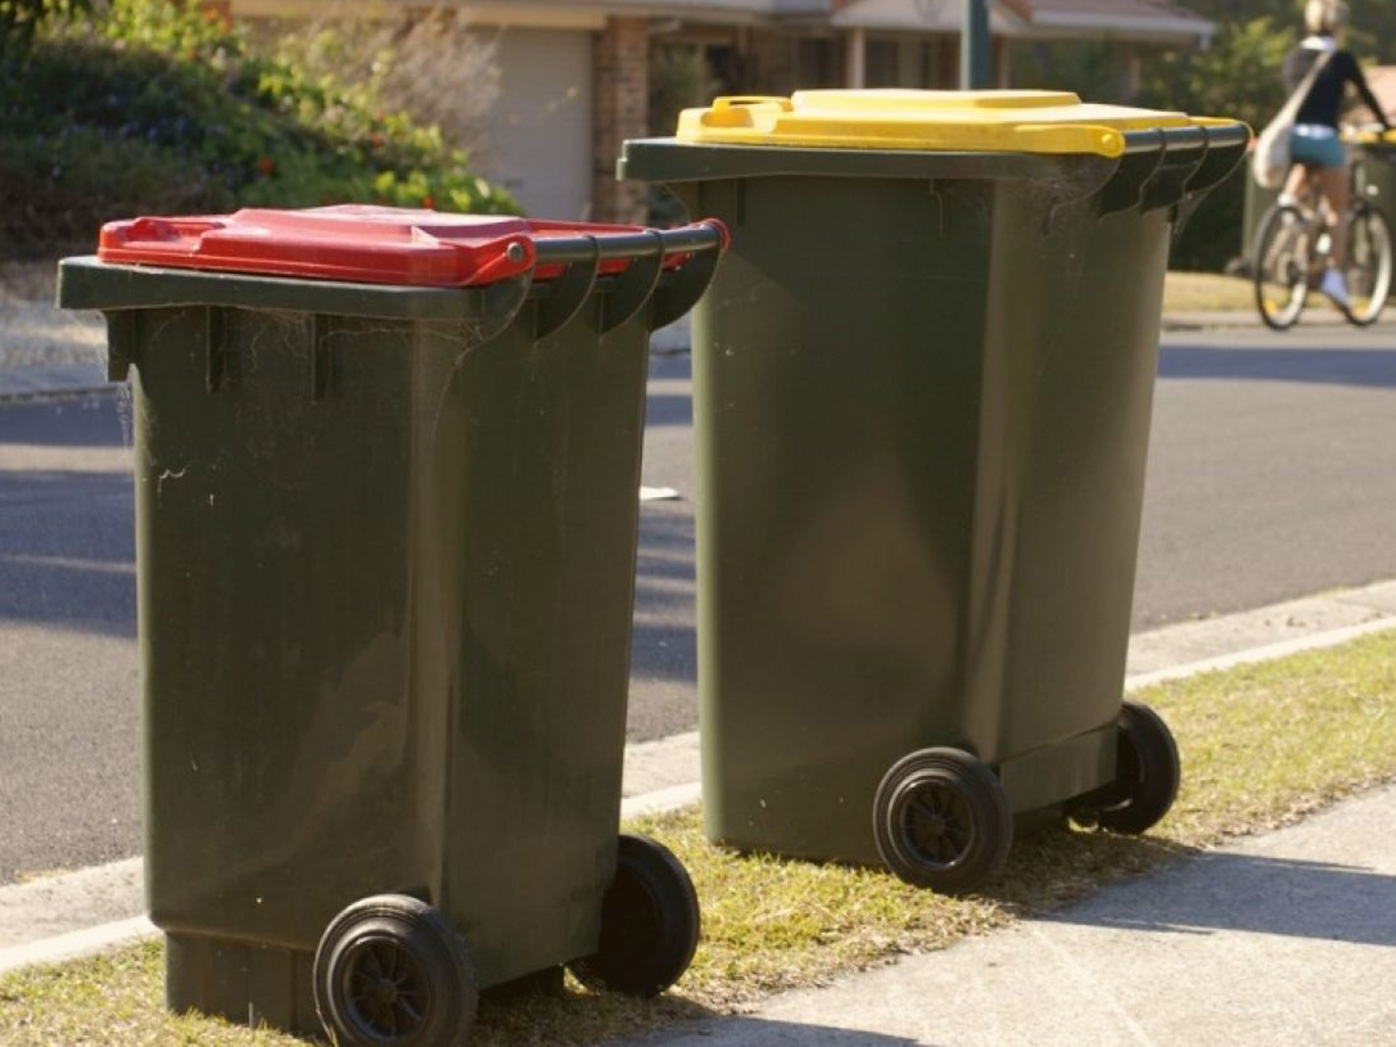 Australian rubbish bins on a suburban street